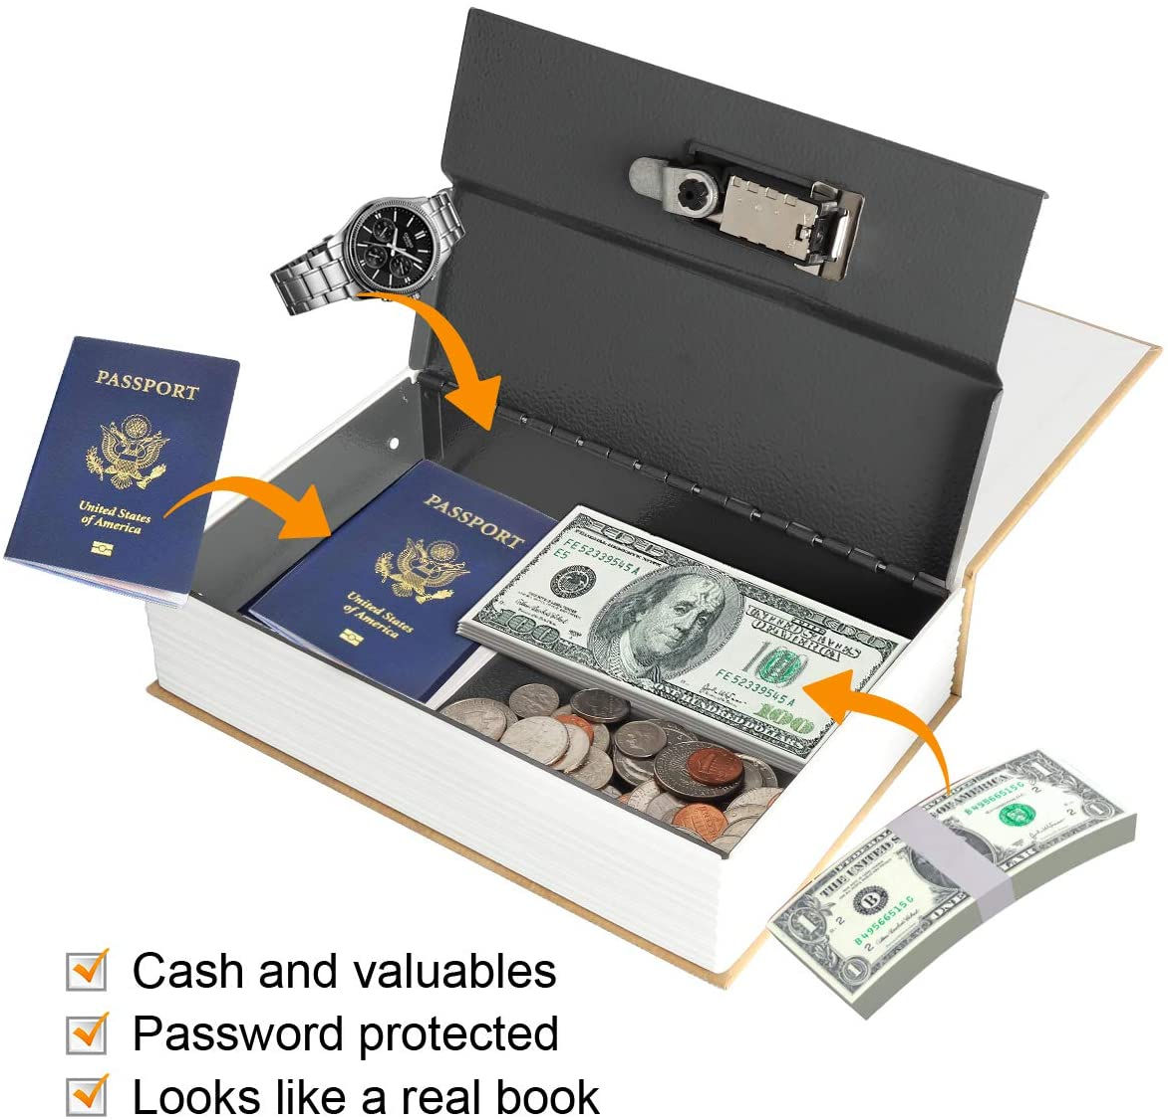 Secrect Hidden Safe Lock Box Large Jssmst Diversion Book Safe with Combination Lock SMBS019 Holy Bible